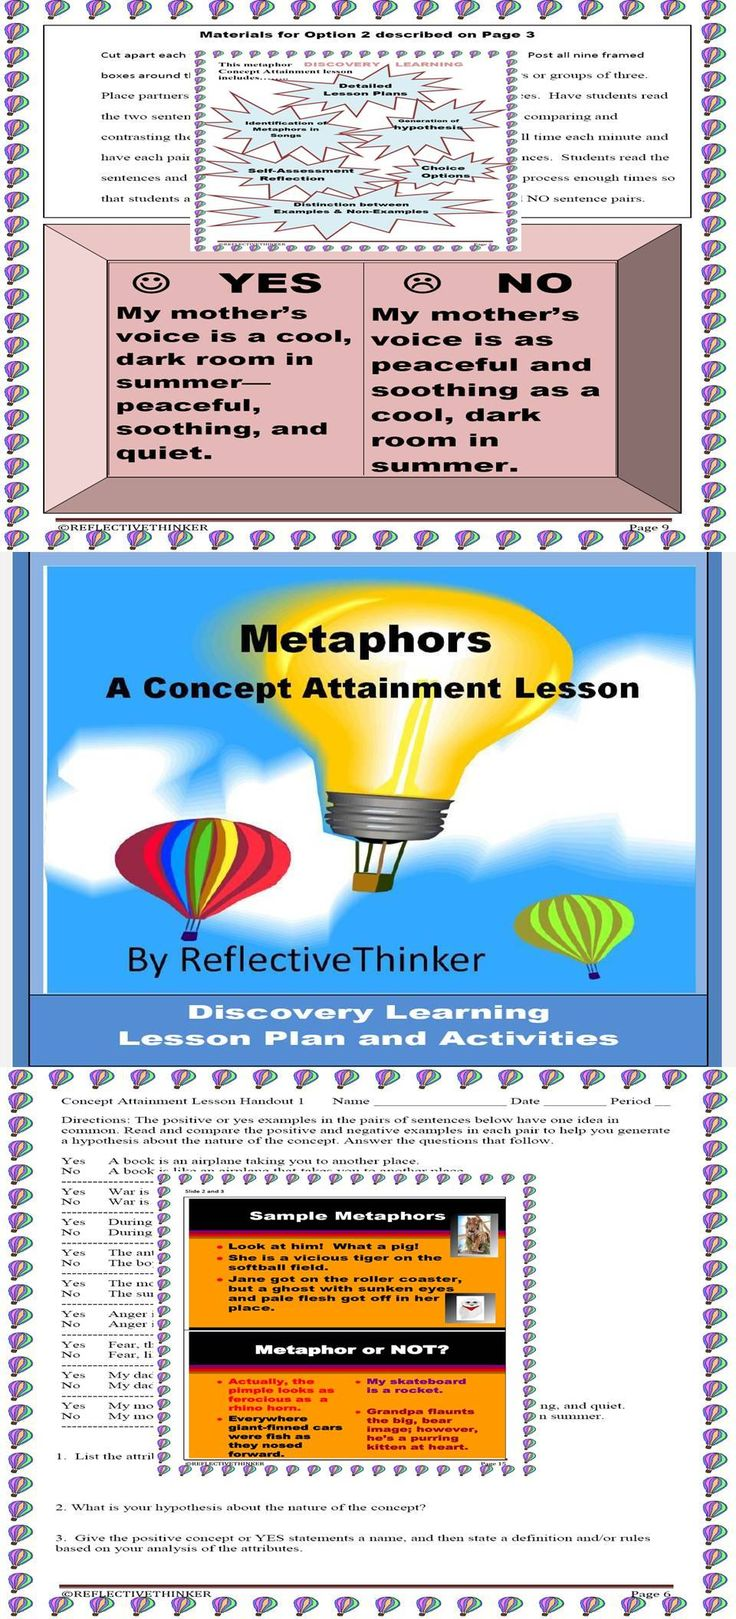 8th grade writing assessment georgia examples of metaphors